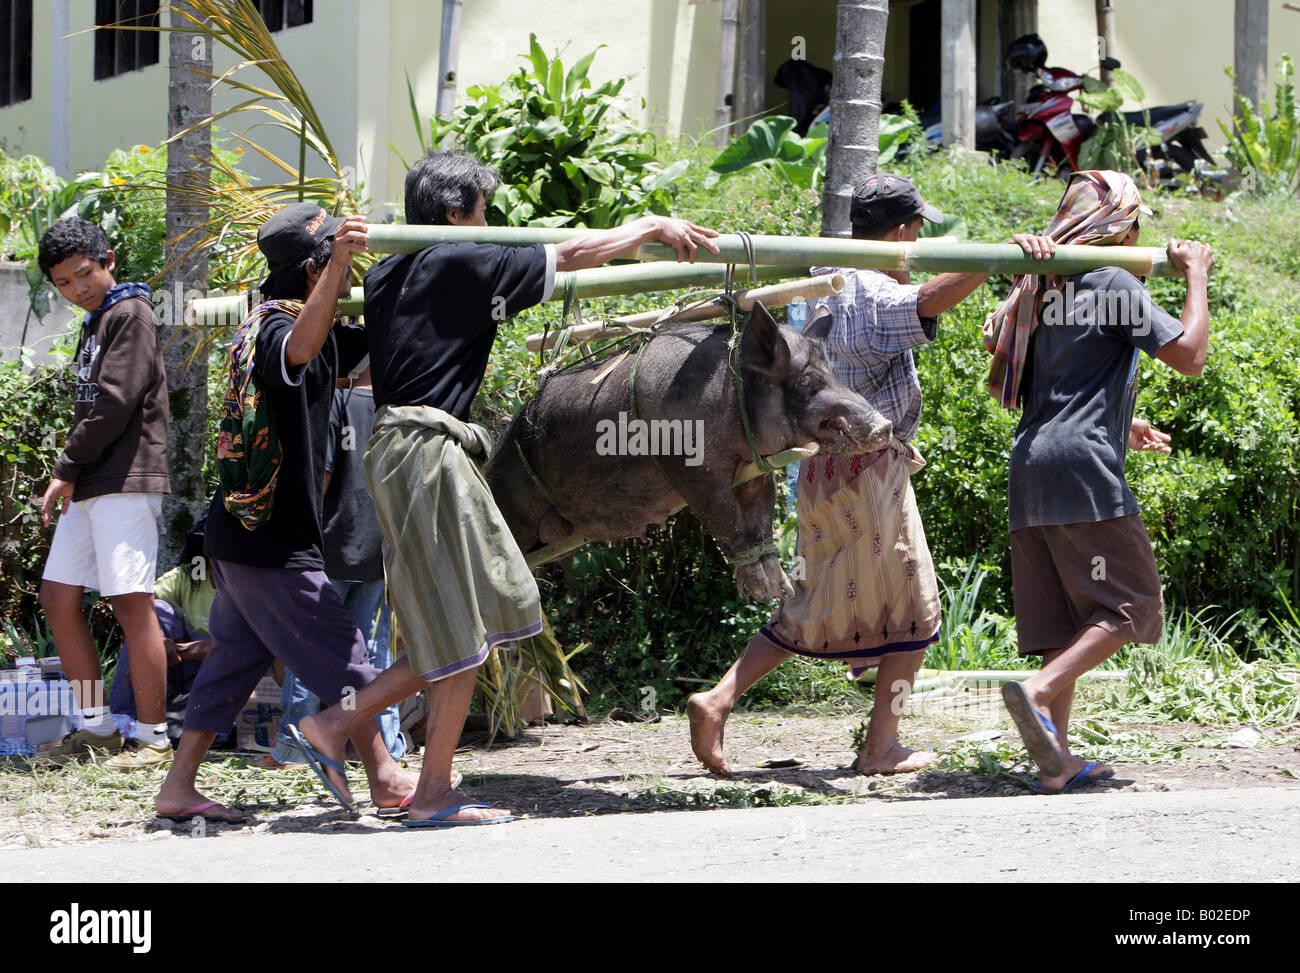 Indonesia, Sulawesi, Tanatoraja, pigs for sacrifice during funeral rites - Stock Image